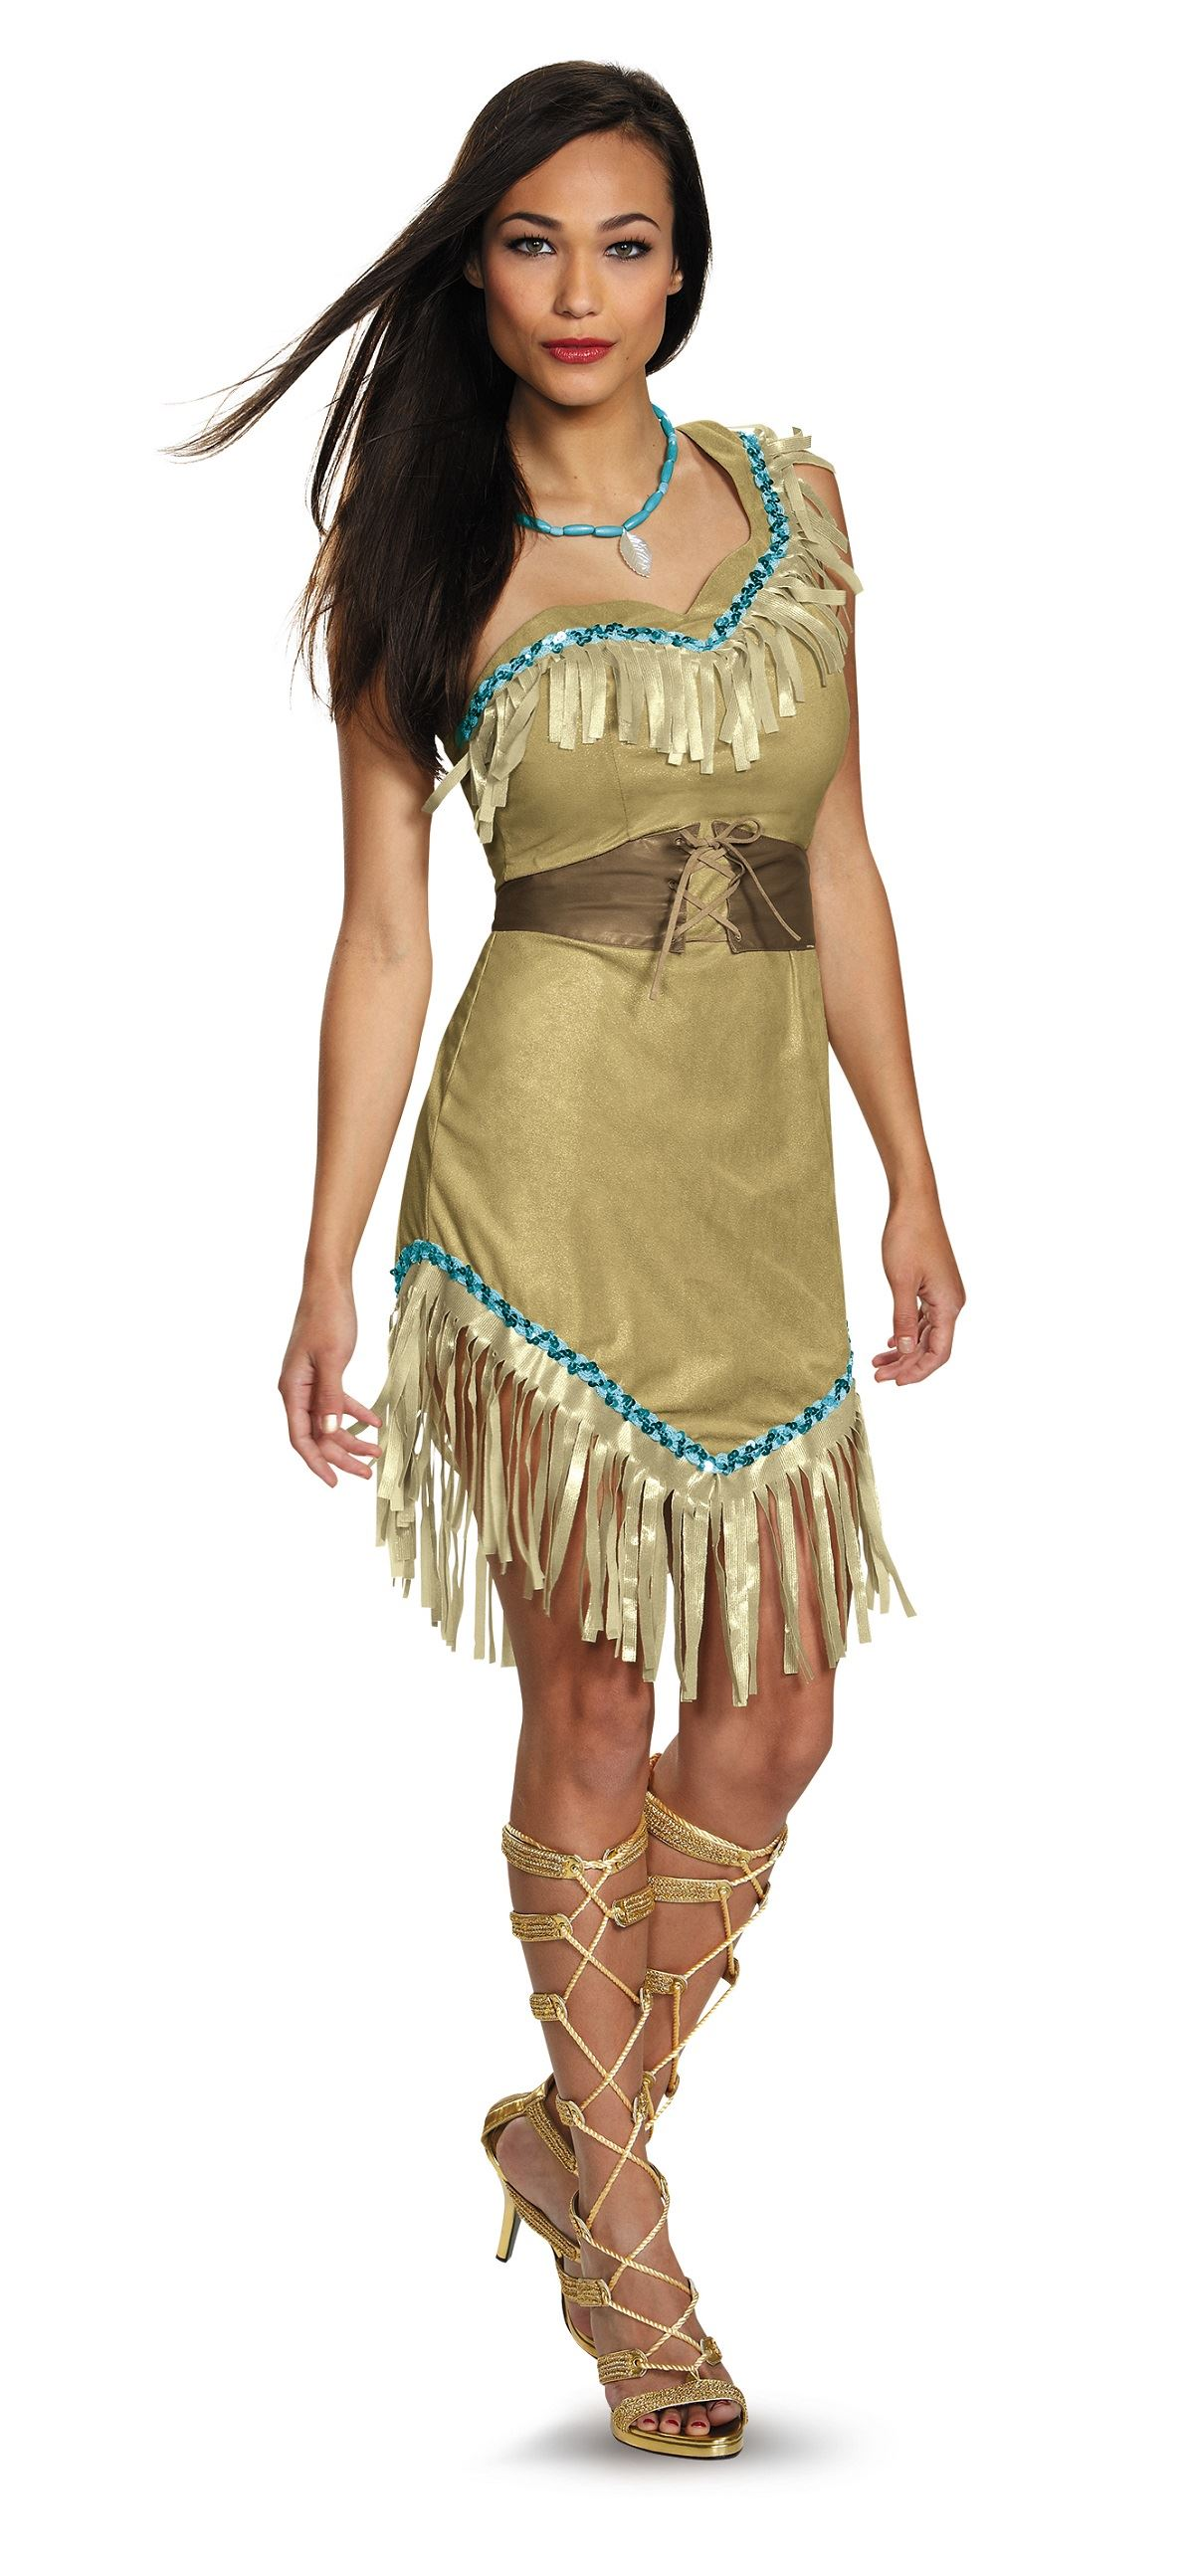 adult pocahontas disney princess woman costume the costume land. Black Bedroom Furniture Sets. Home Design Ideas